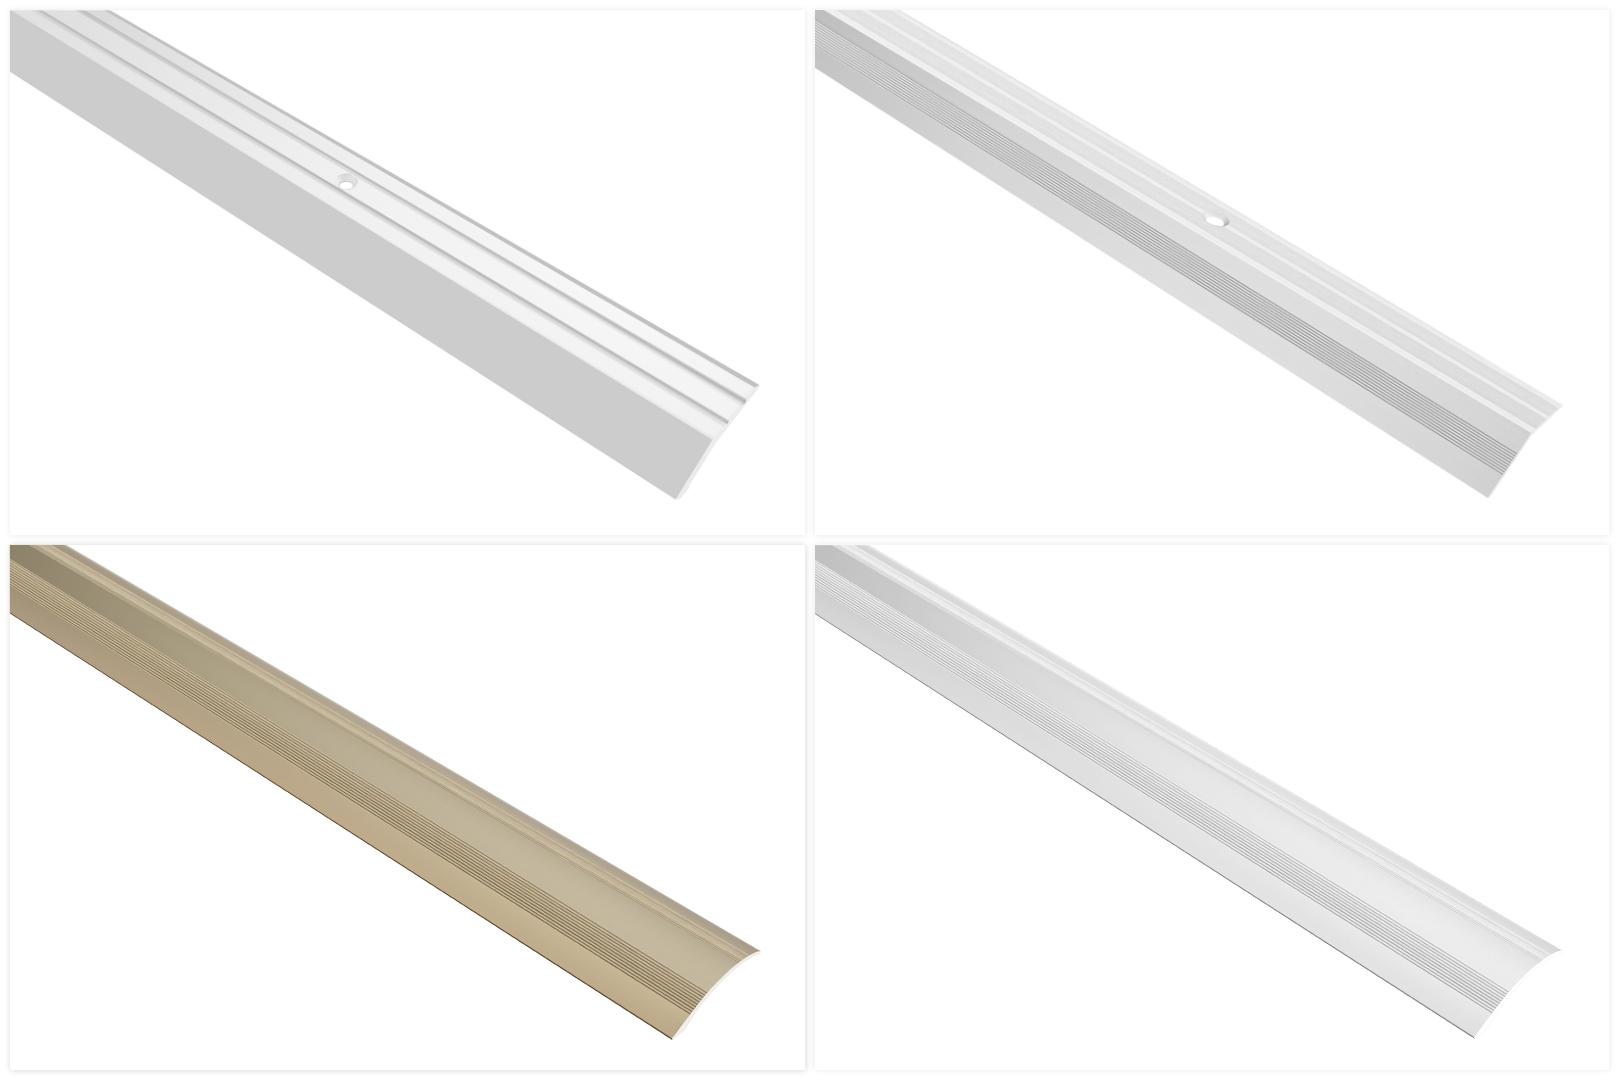 Abschlussprofile aus Aluminium, langlebig & rostfrei für den perfekten Abschluss jedes Bodenbelages